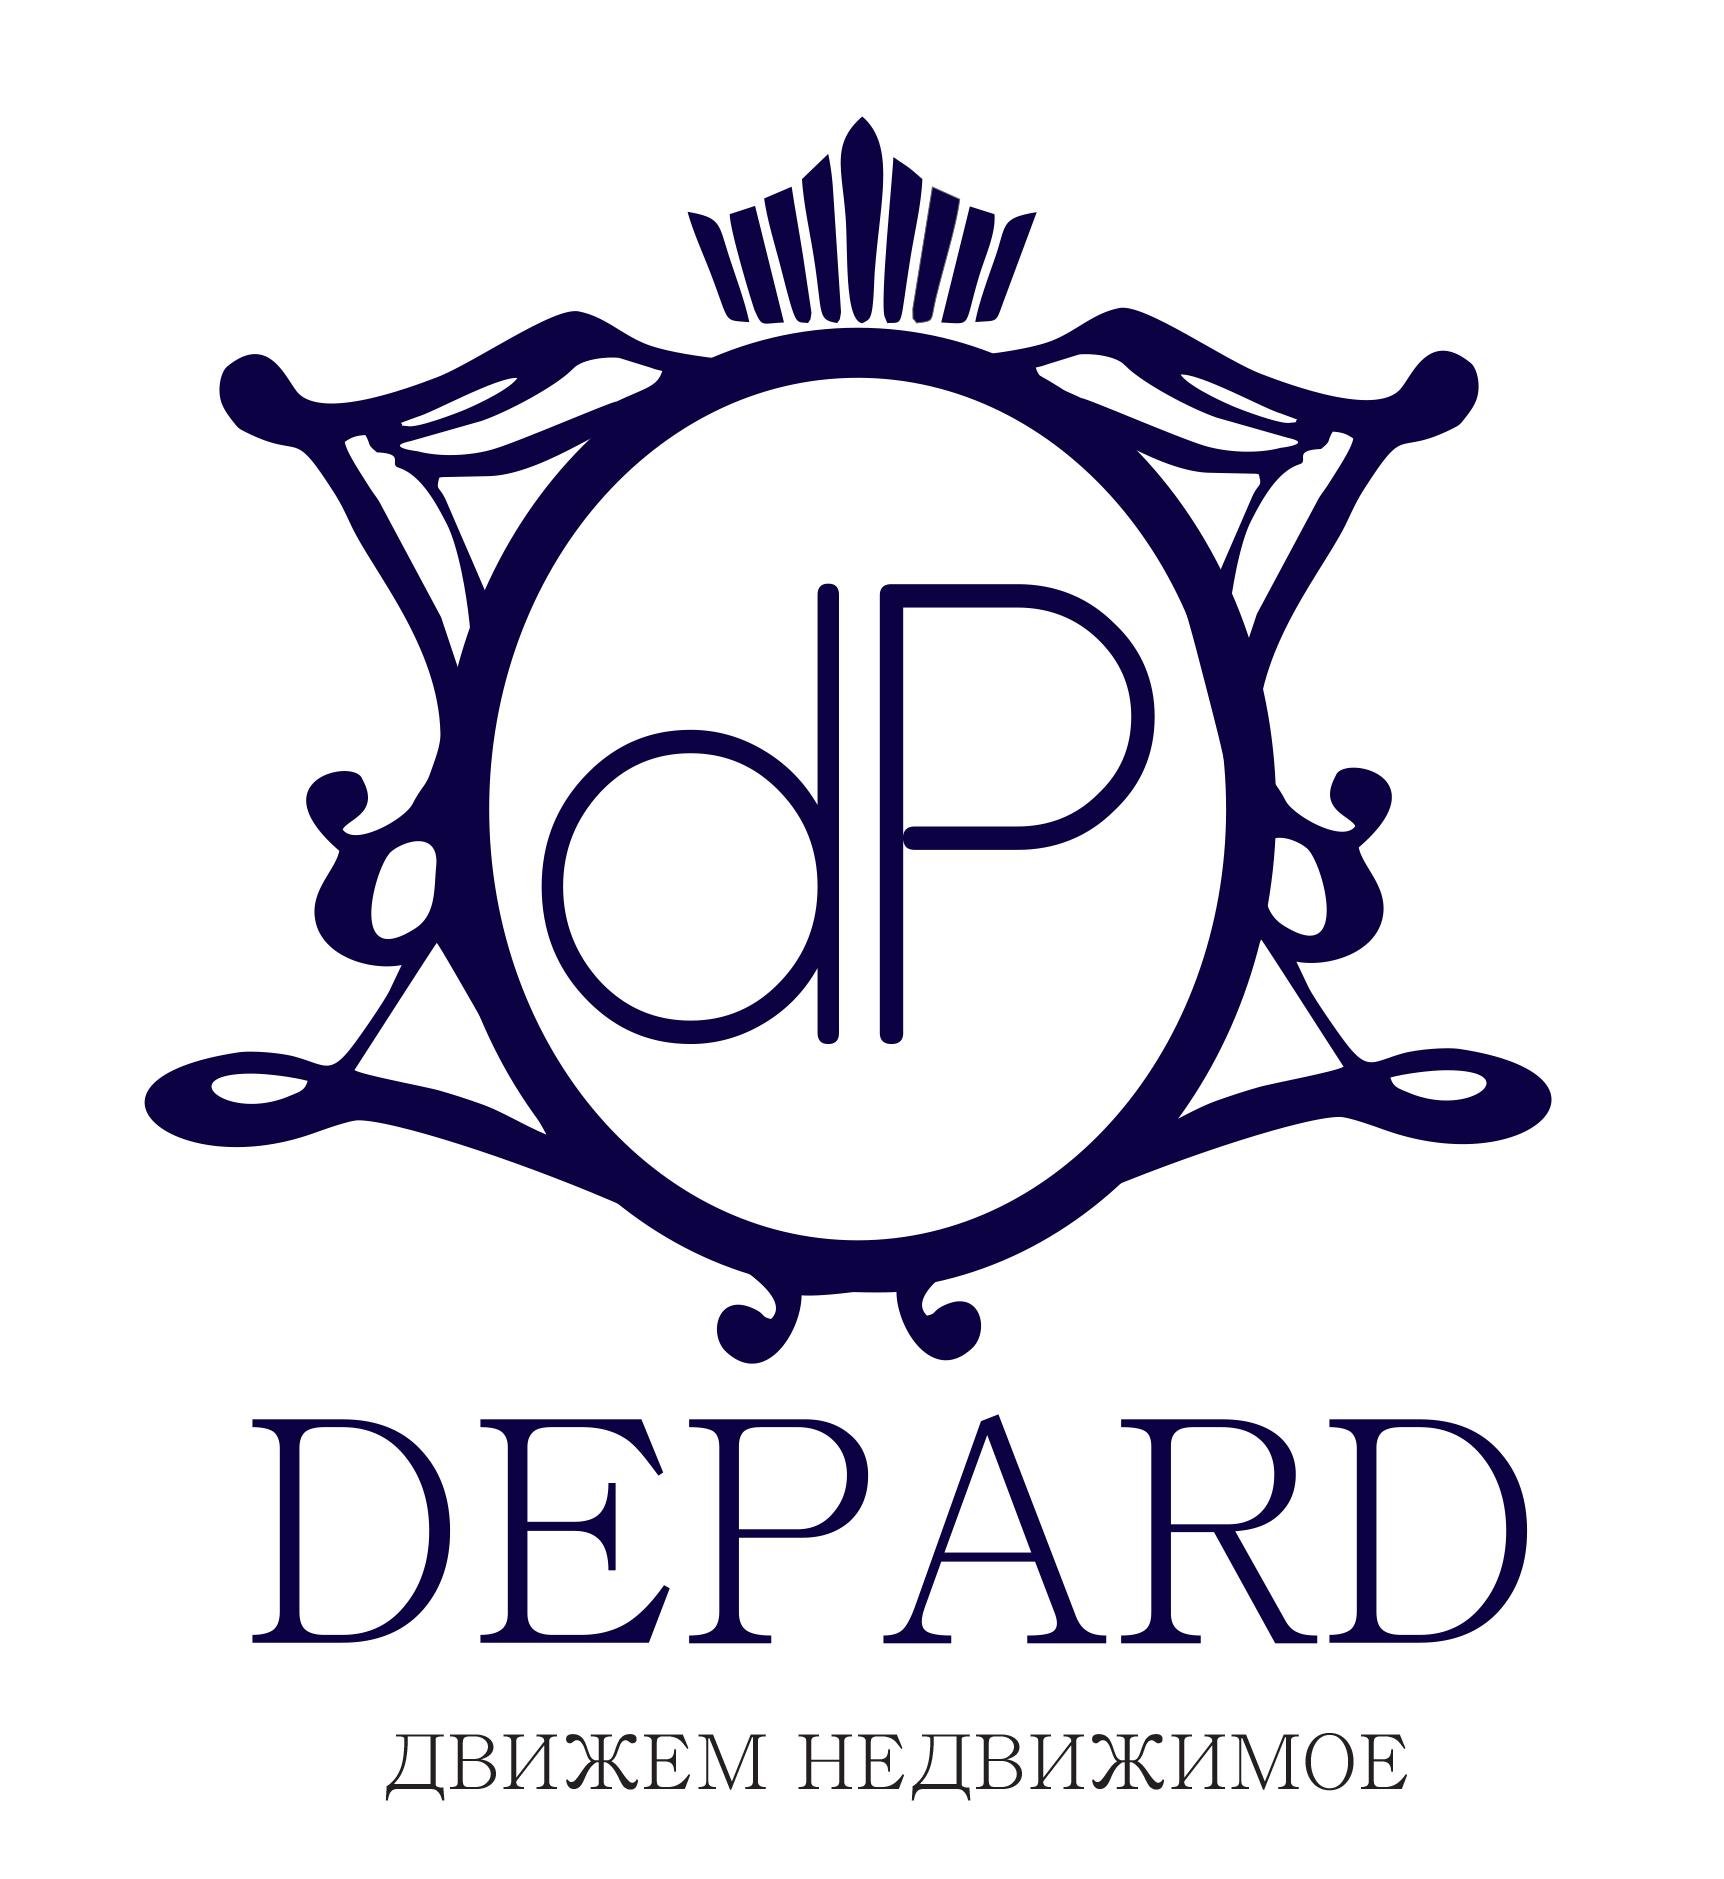 Логотип для компании (услуги недвижимость) фото f_19359315a725fac0.jpg